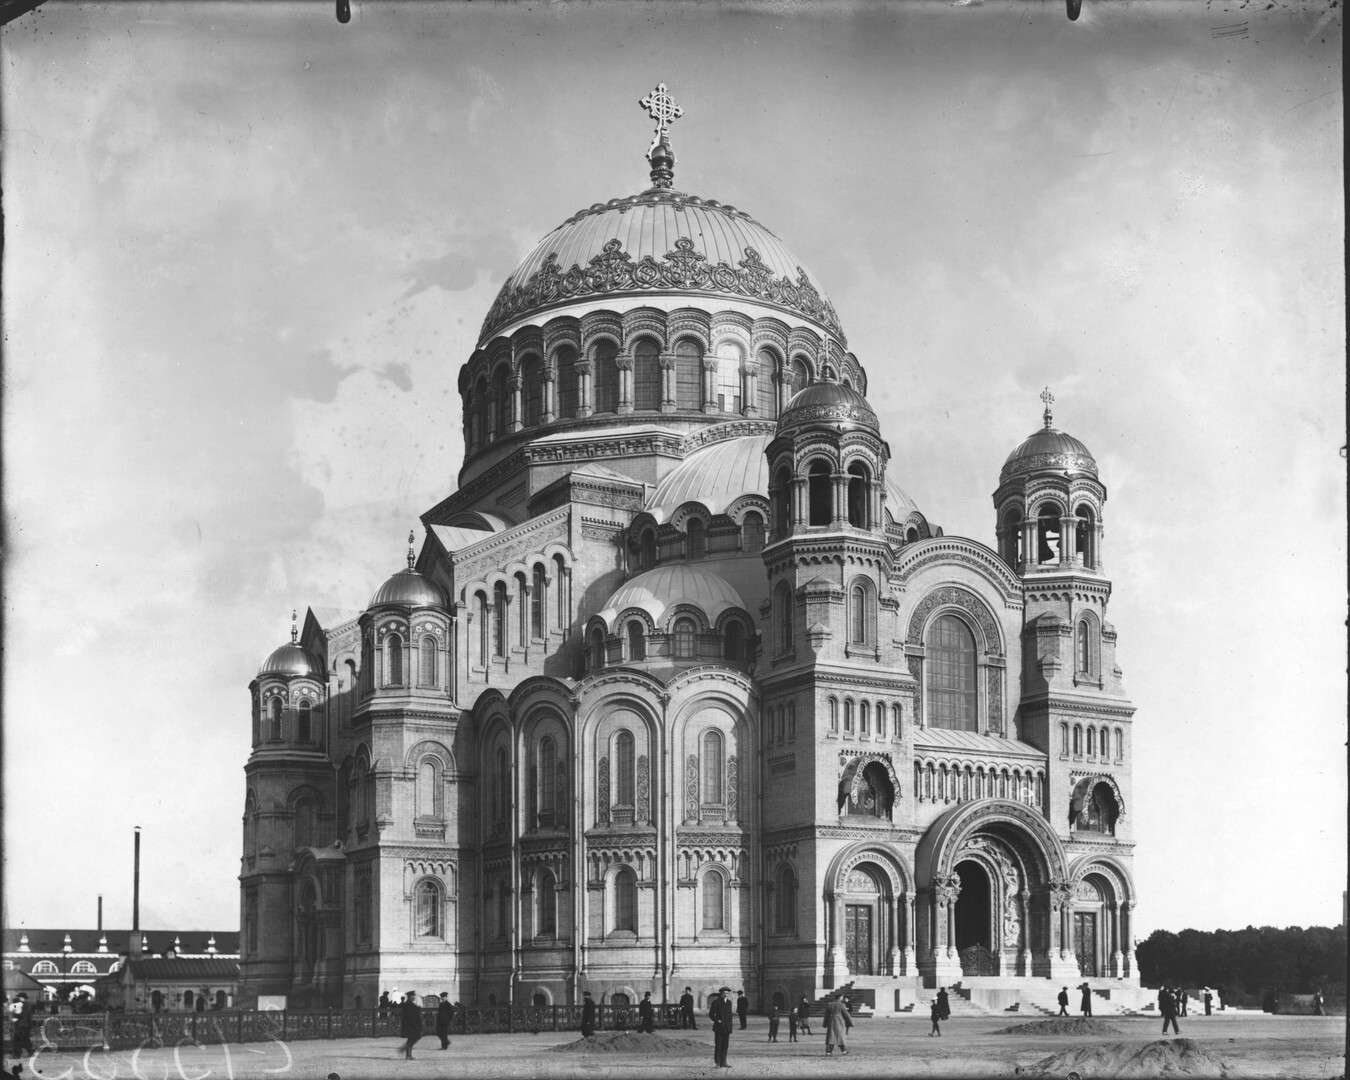 Кронштадский Морской собор. Ателье Буллы, 1913 г.